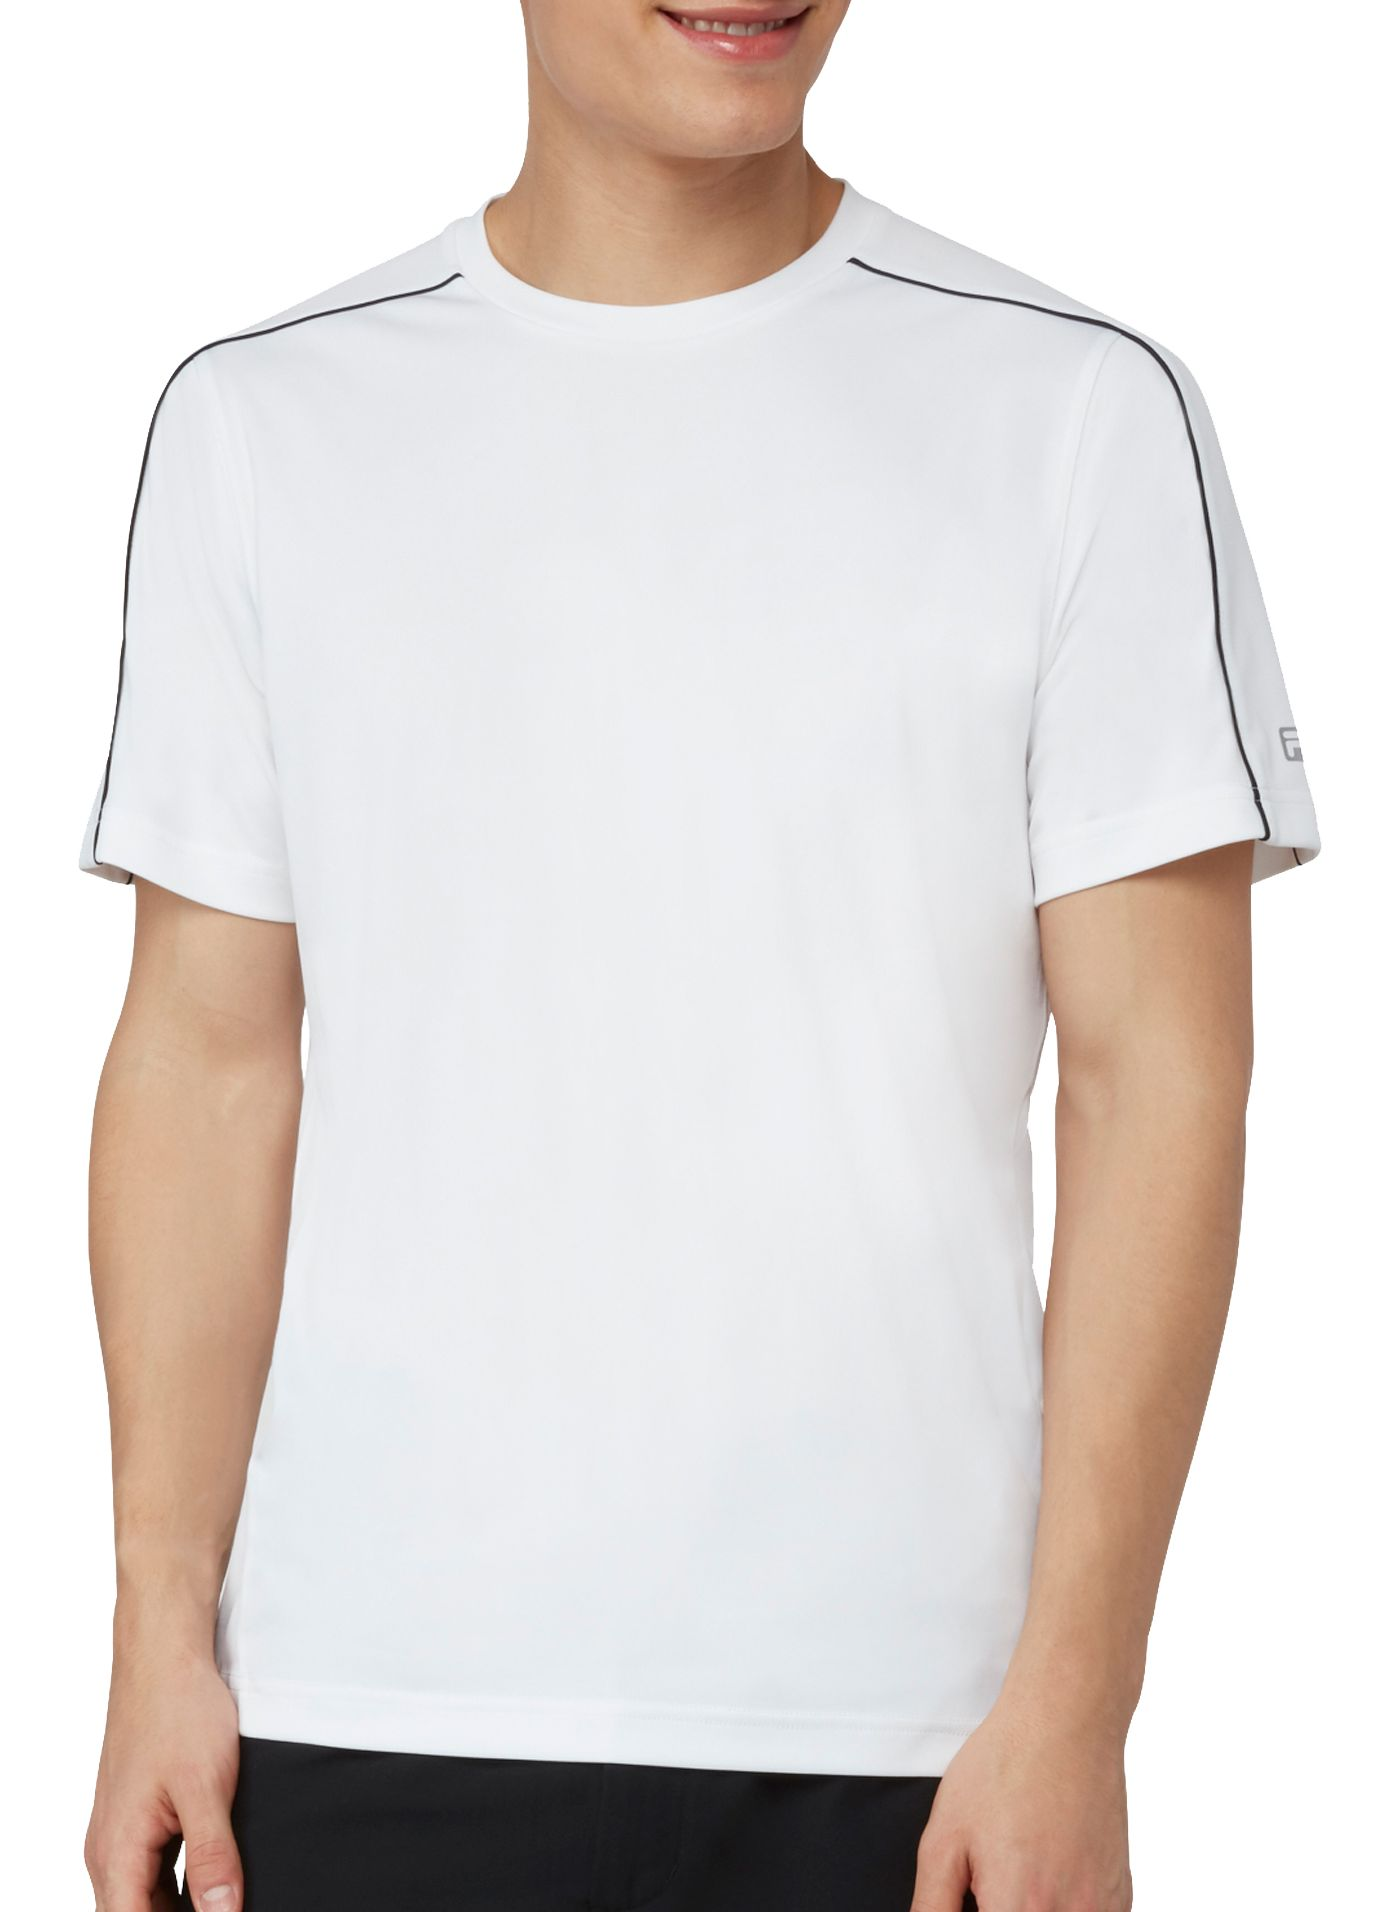 FILA Men's Fundamental Piped Crew Tennis T-Shirt